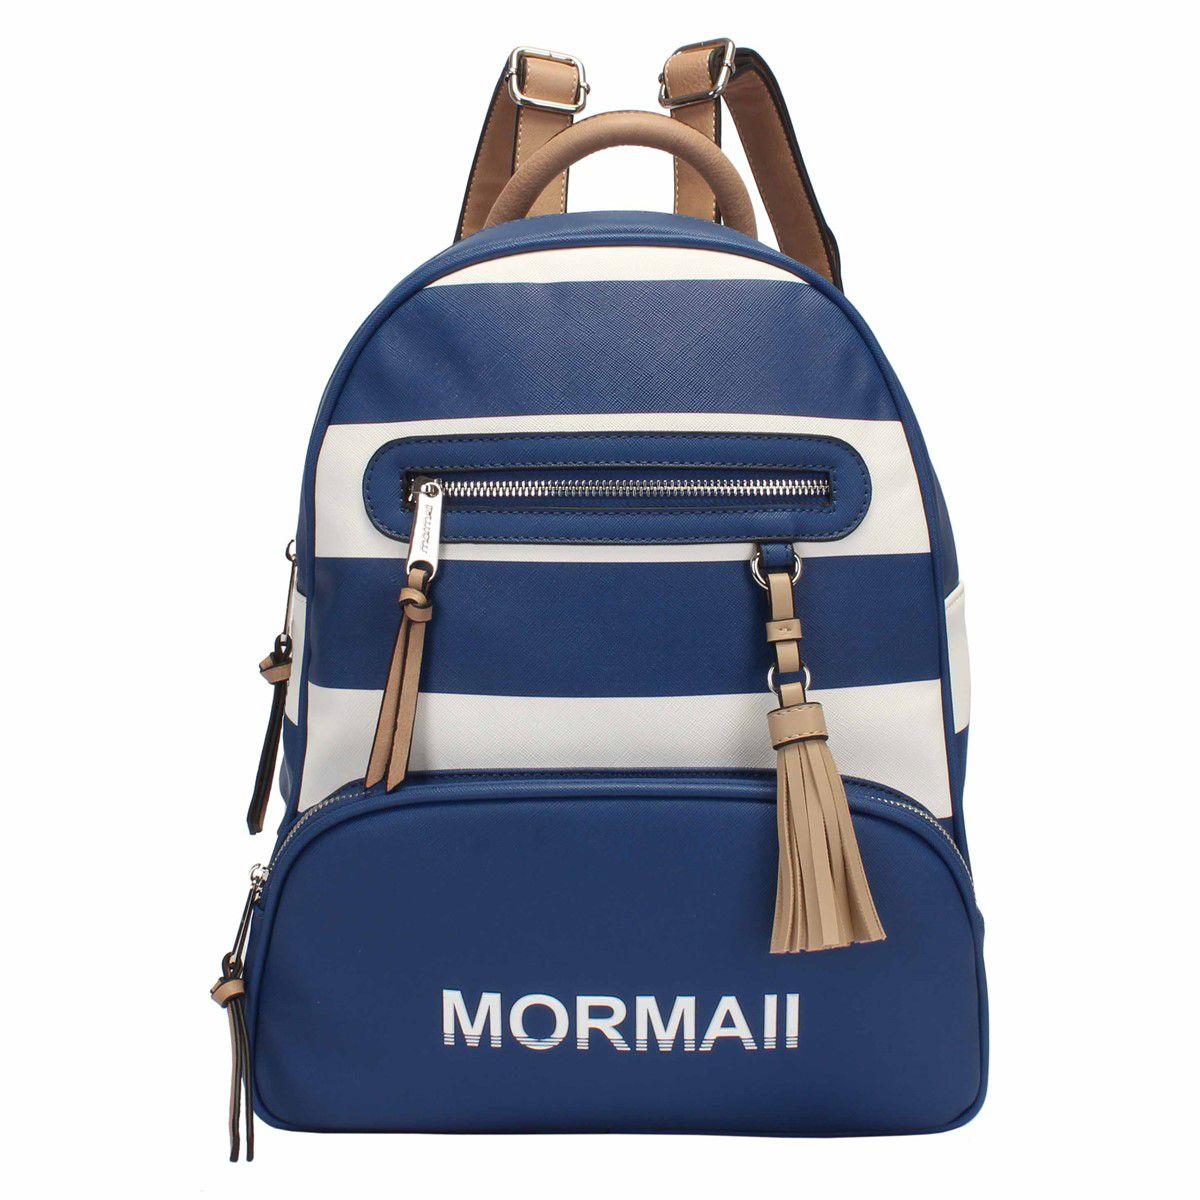 Bolsa Mormaii Mochila Navy Azul